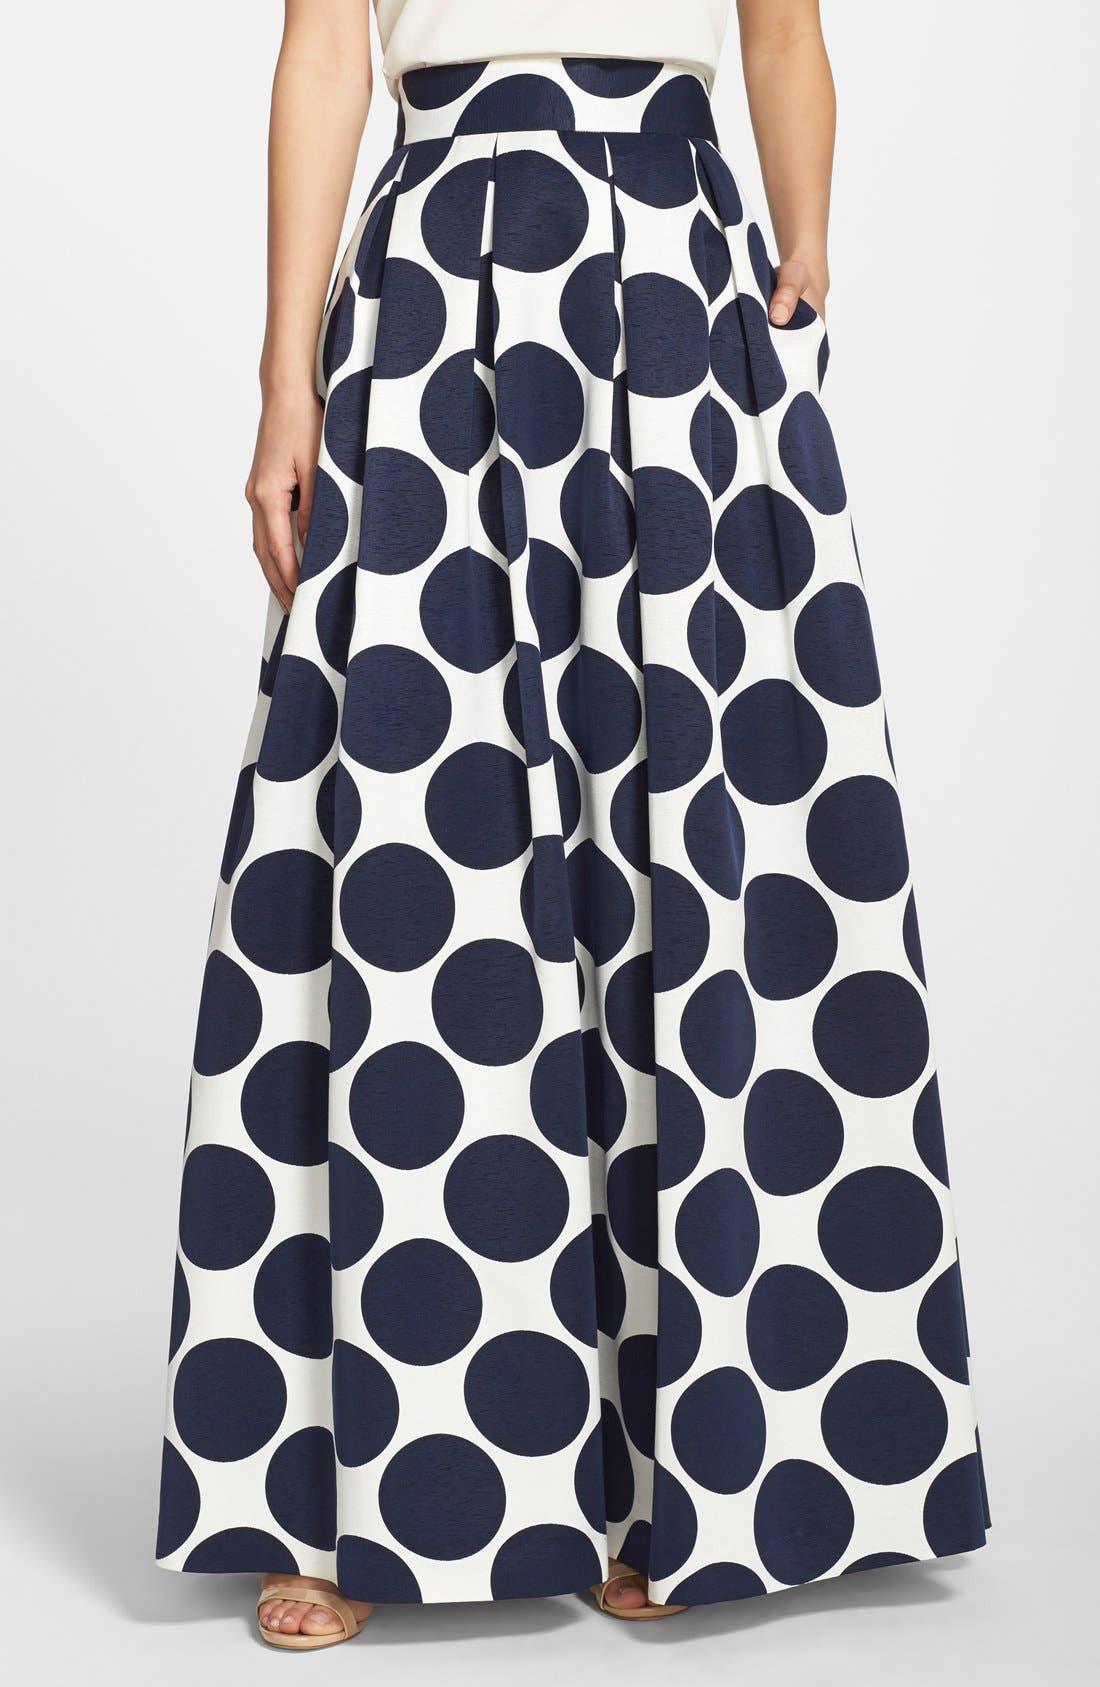 Pleated Dot Print Ball Skirt,                             Main thumbnail 1, color,                             407